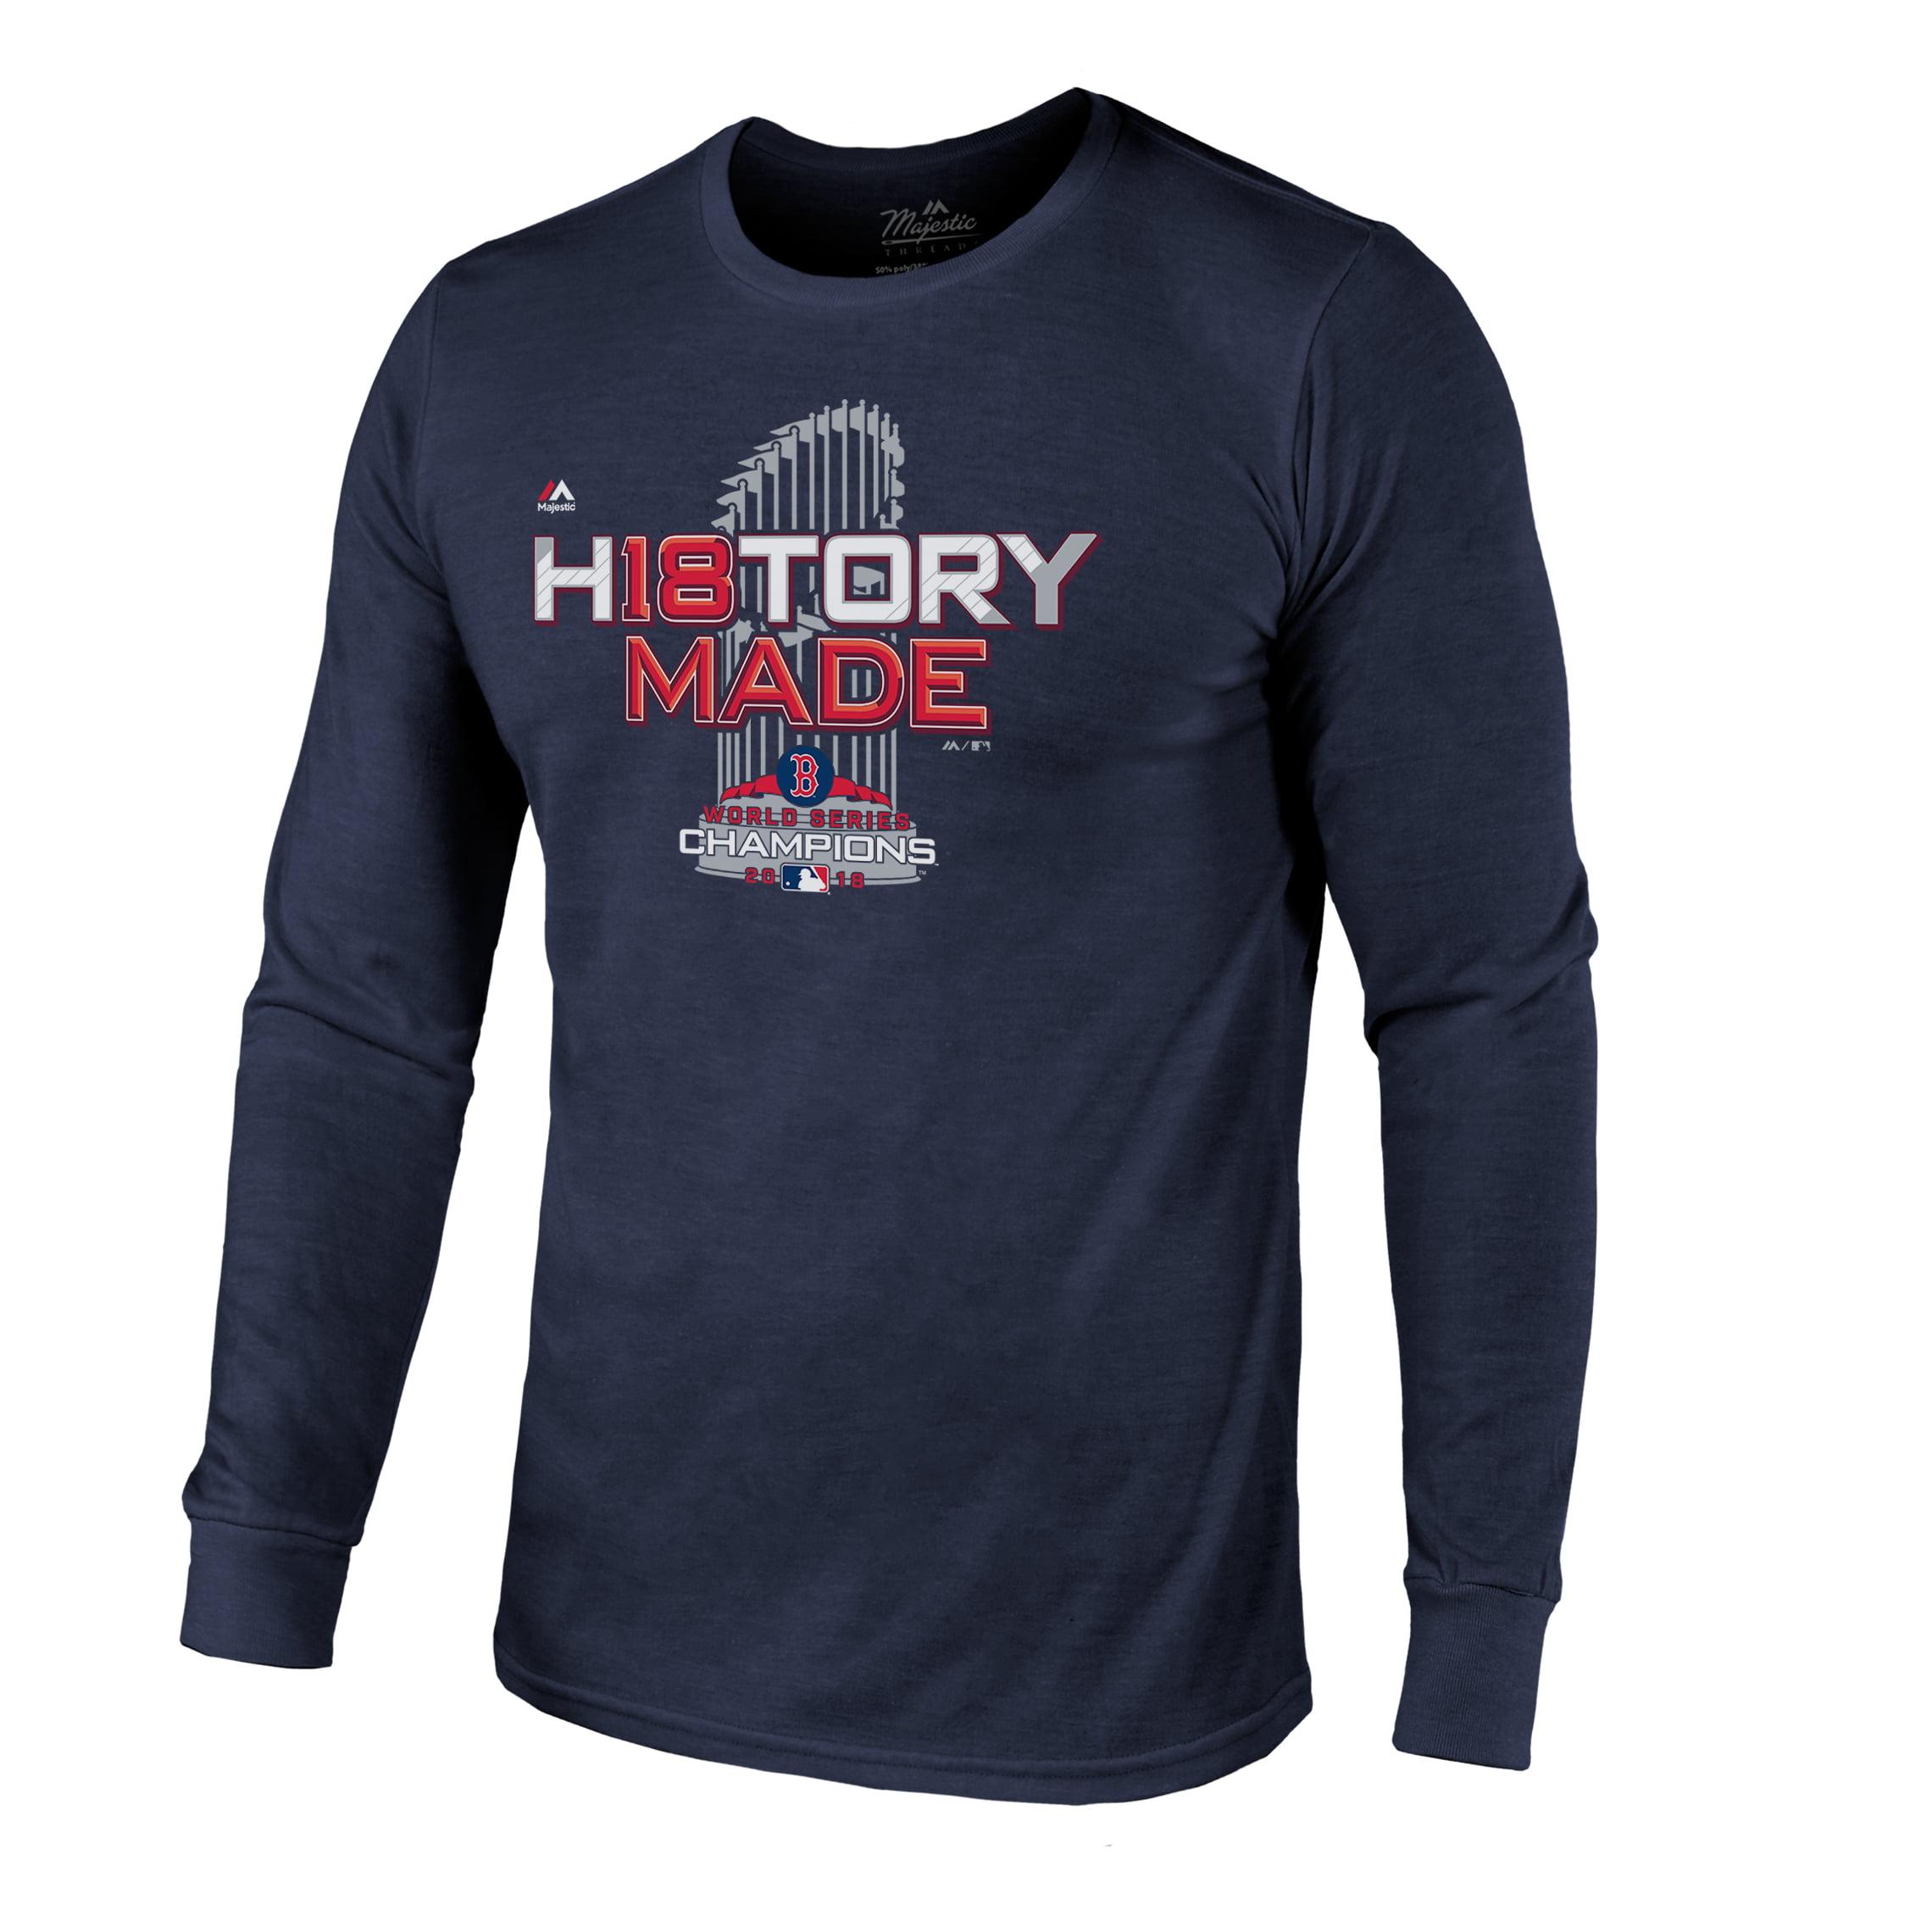 Boston Red Sox Majestic Threads 2018 World Series Champions Locker Room Tri-Blend Long Sleeve T-Shirt - Navy